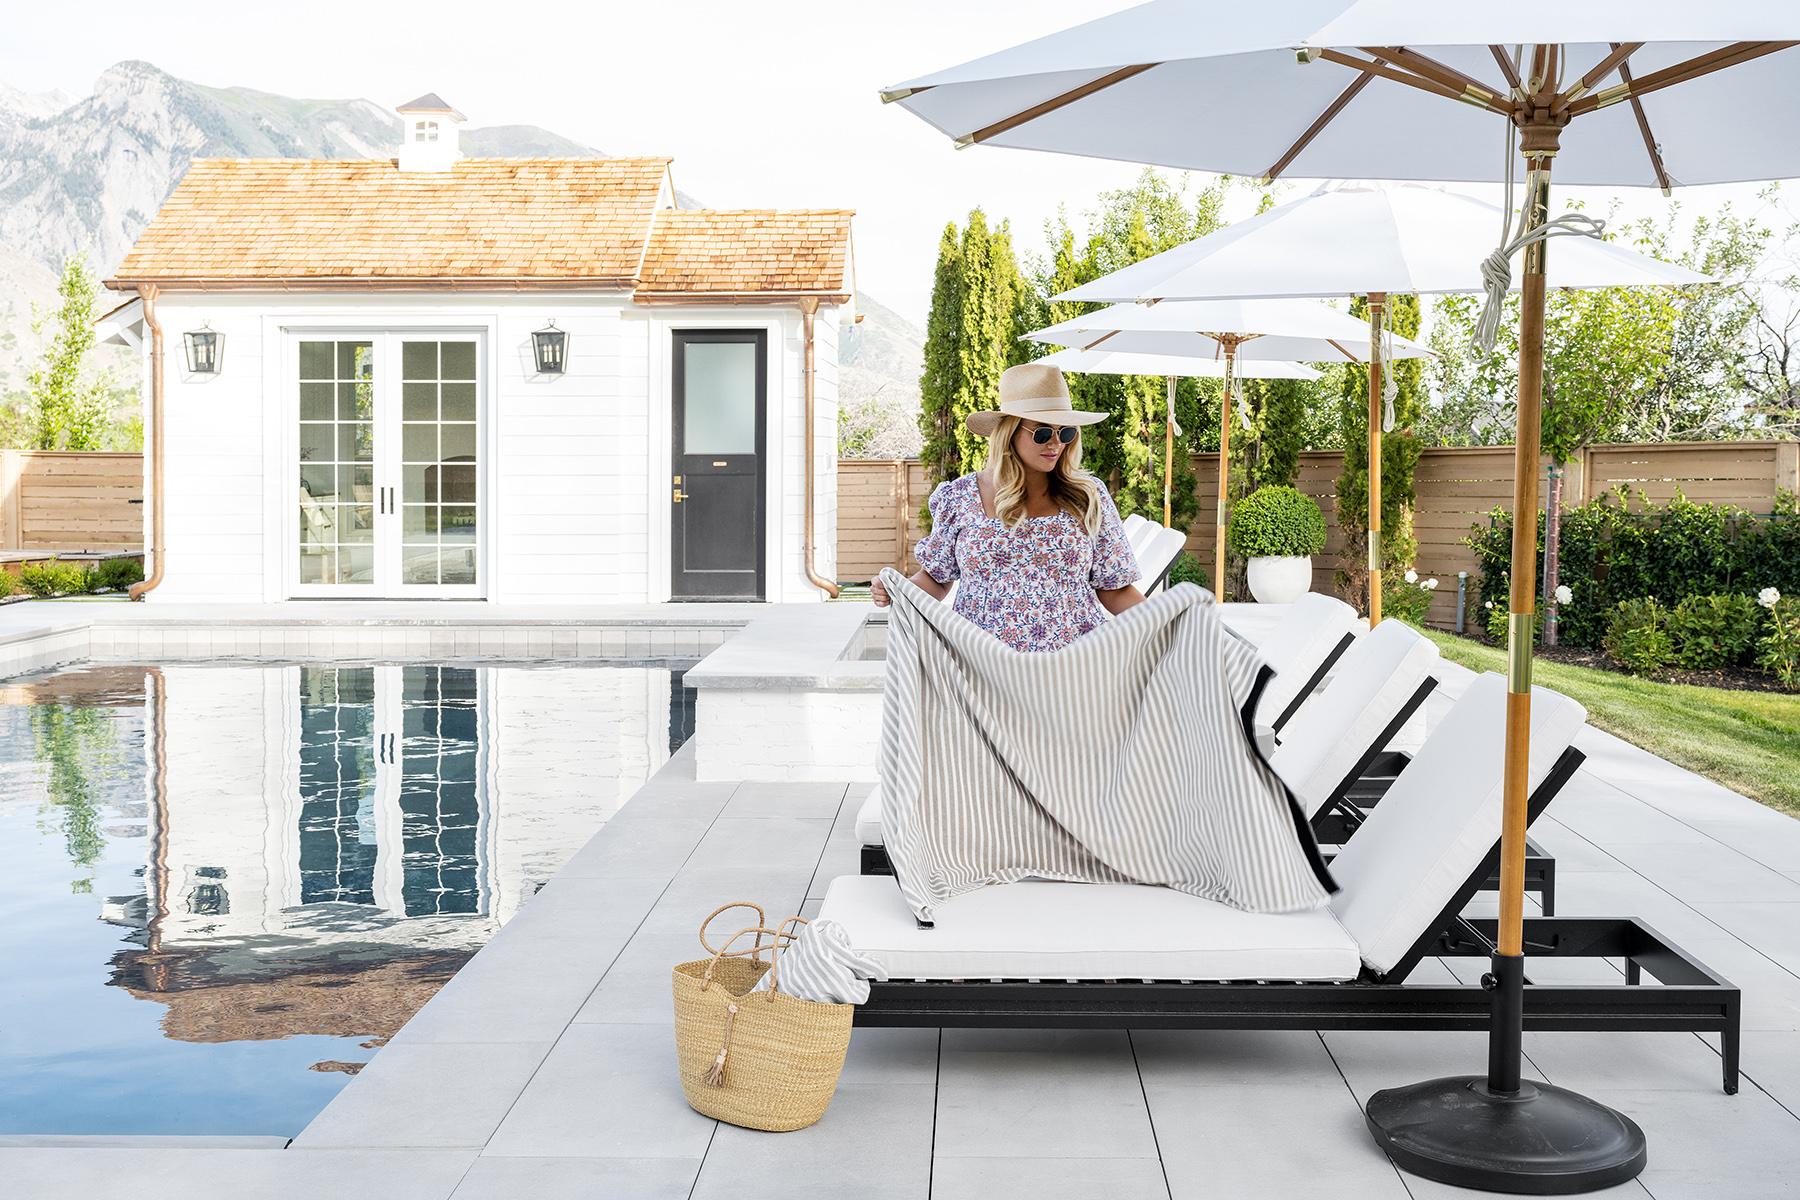 The McGee Home Pool Reveal